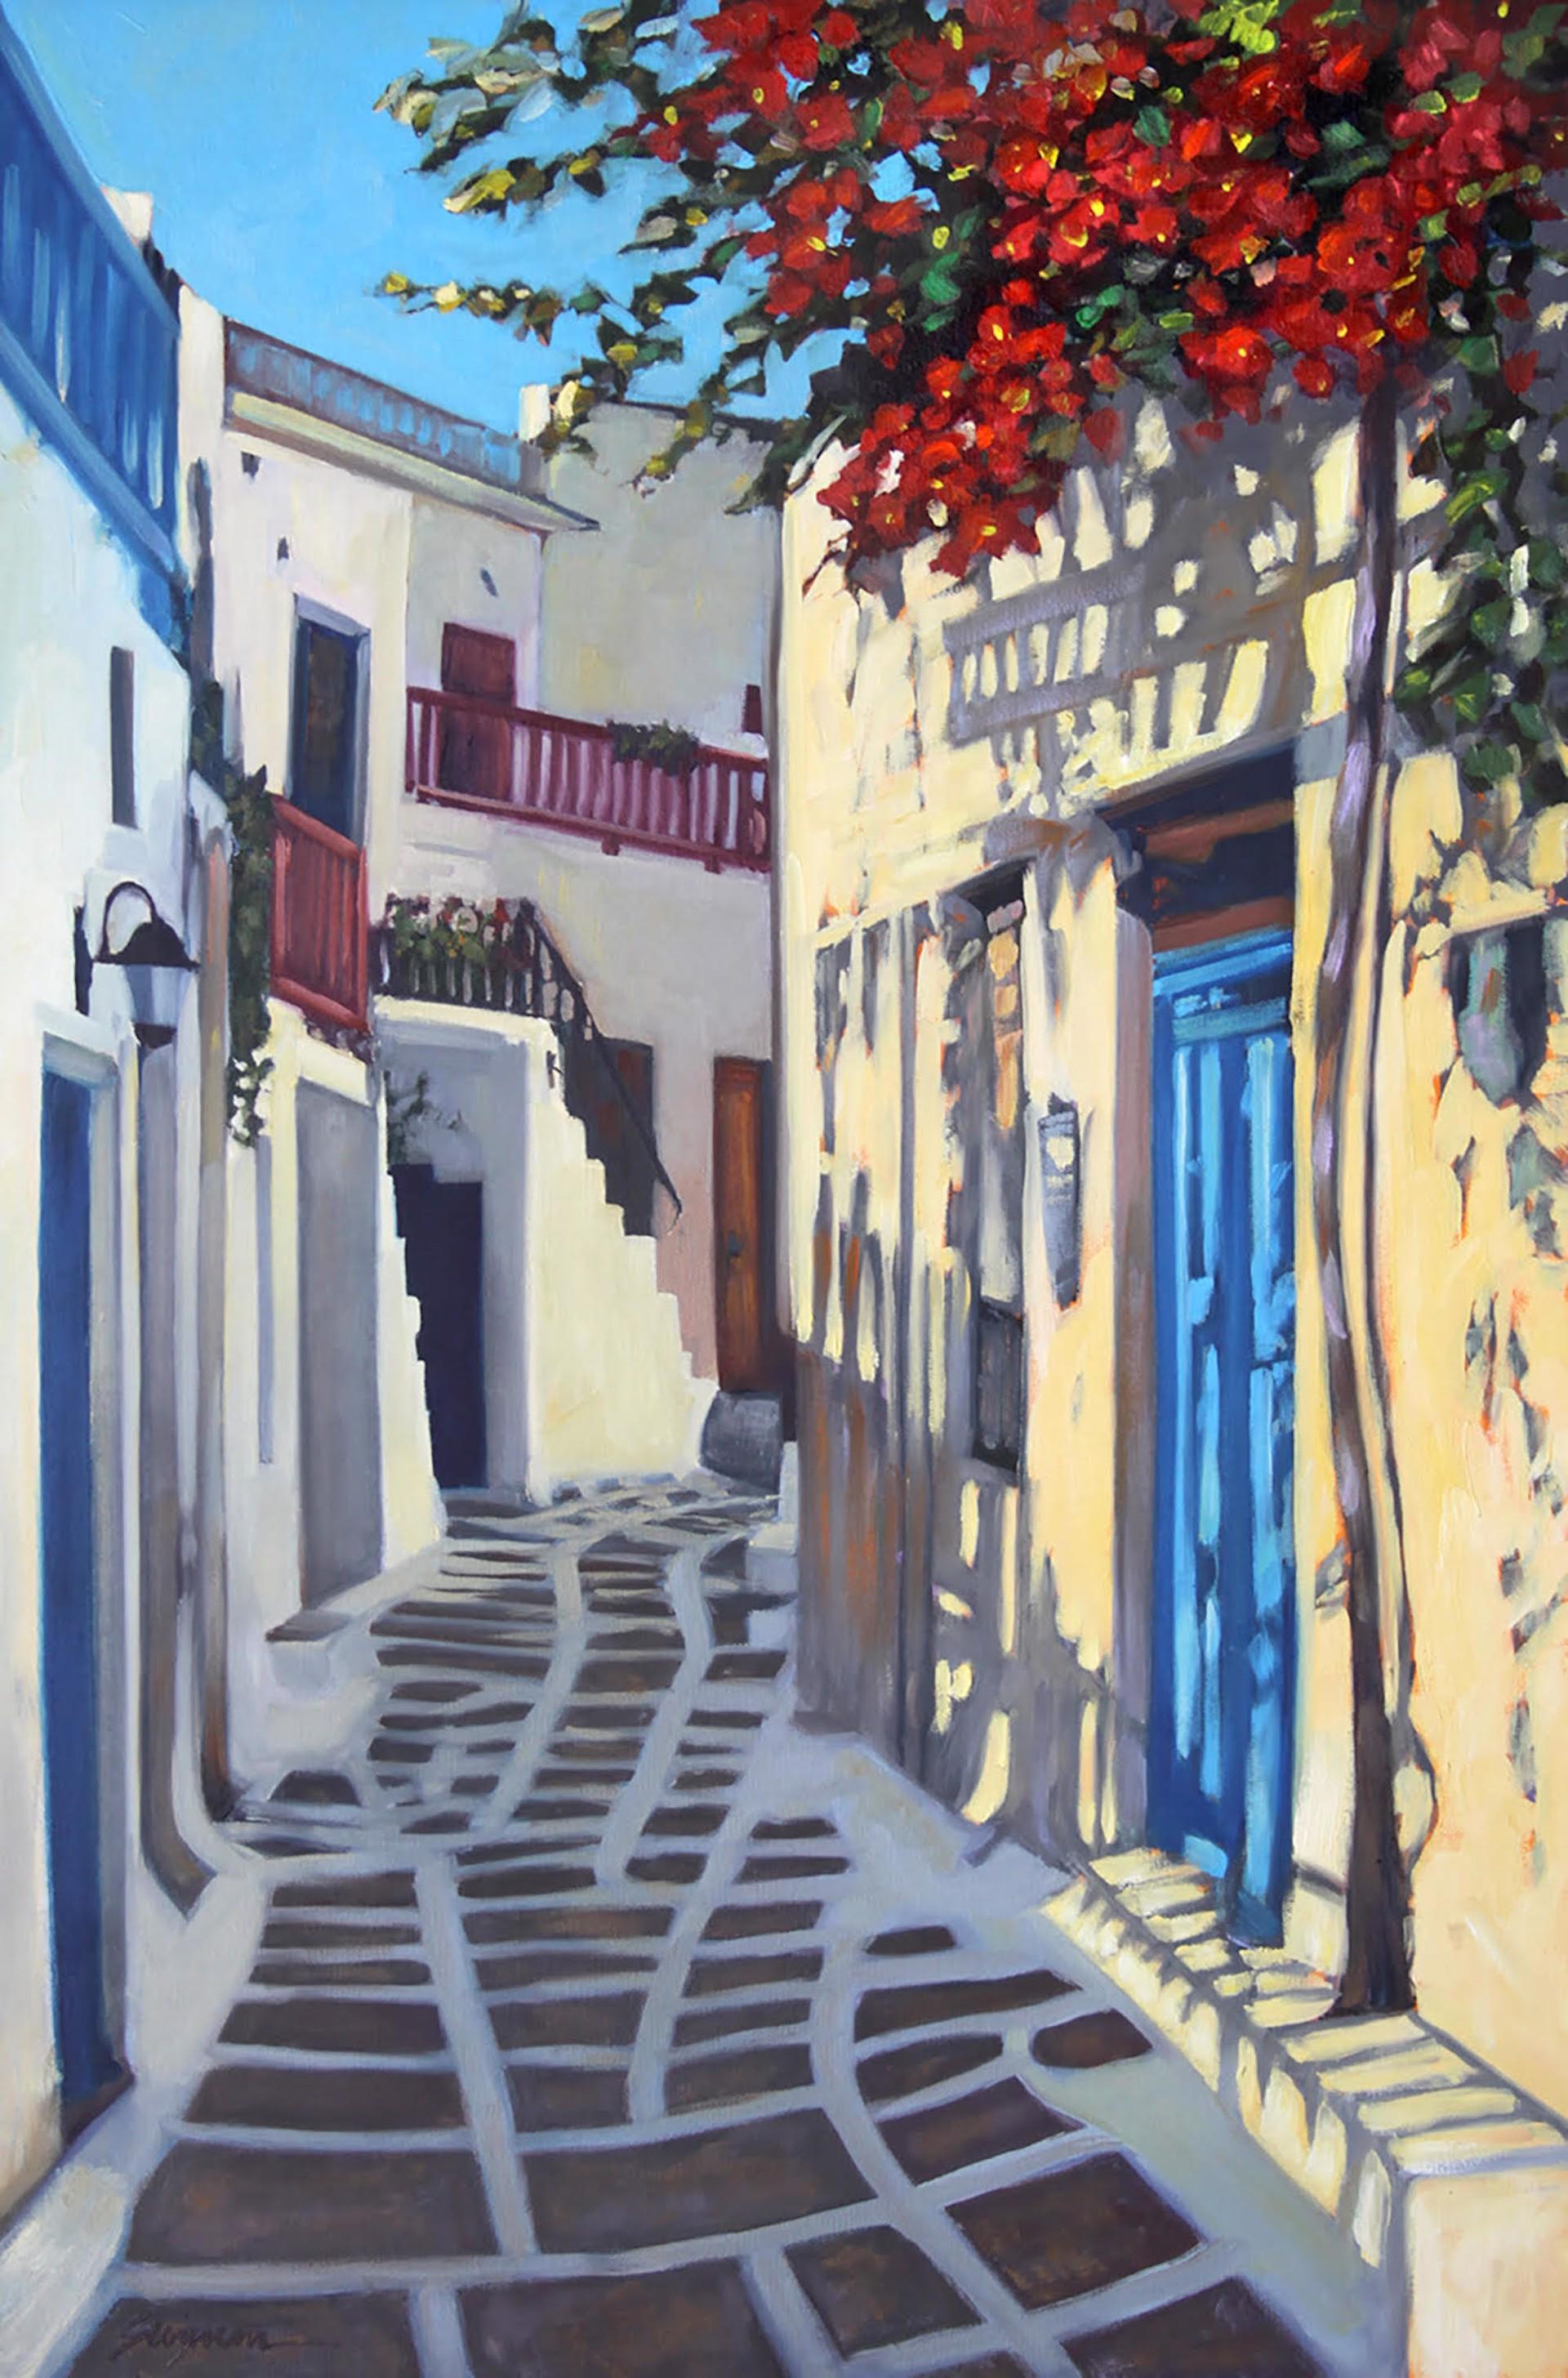 Morning In Paros by Tom Swimm